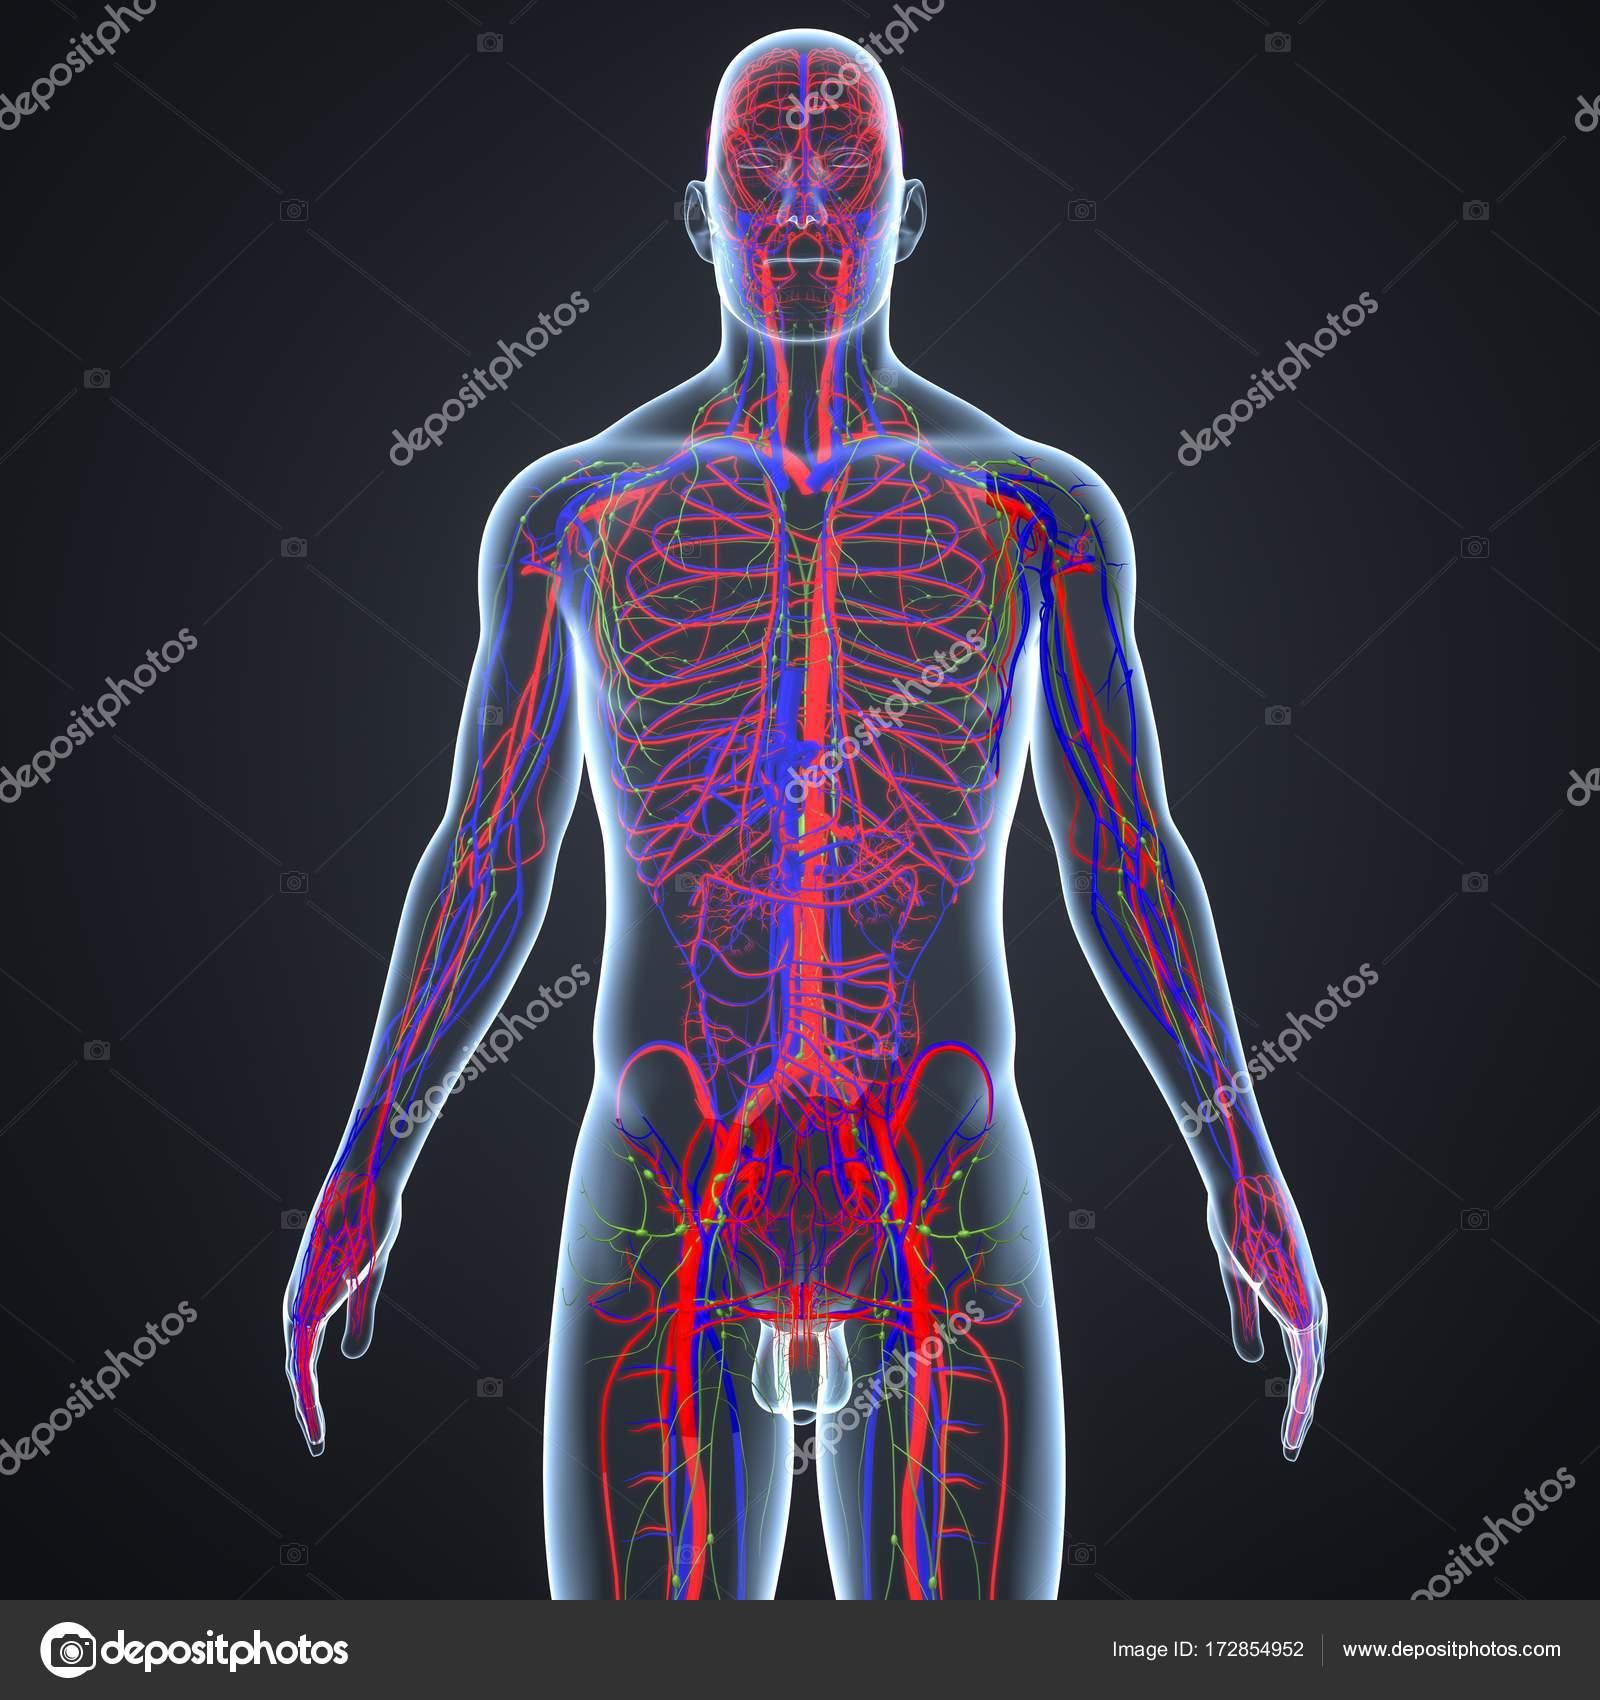 Blutgefäße und Lymphknoten — Stockfoto © sciencepics #172854952